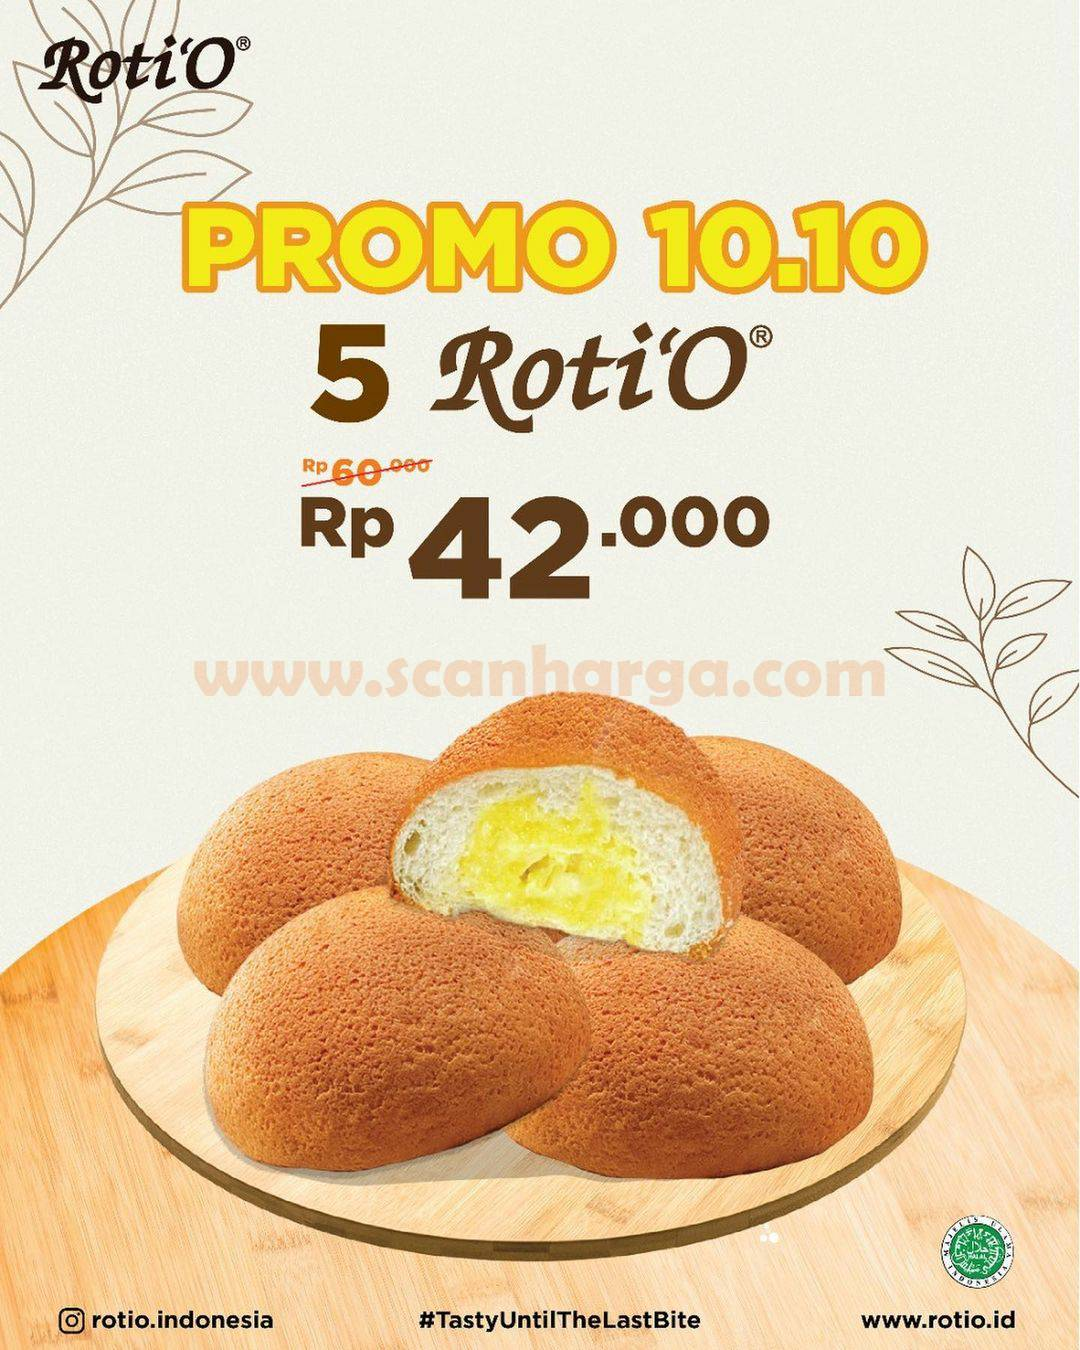 Promo Roti O Spesial 10.10 Beli 10 Roti'O Cuma Rp. 80.000 2